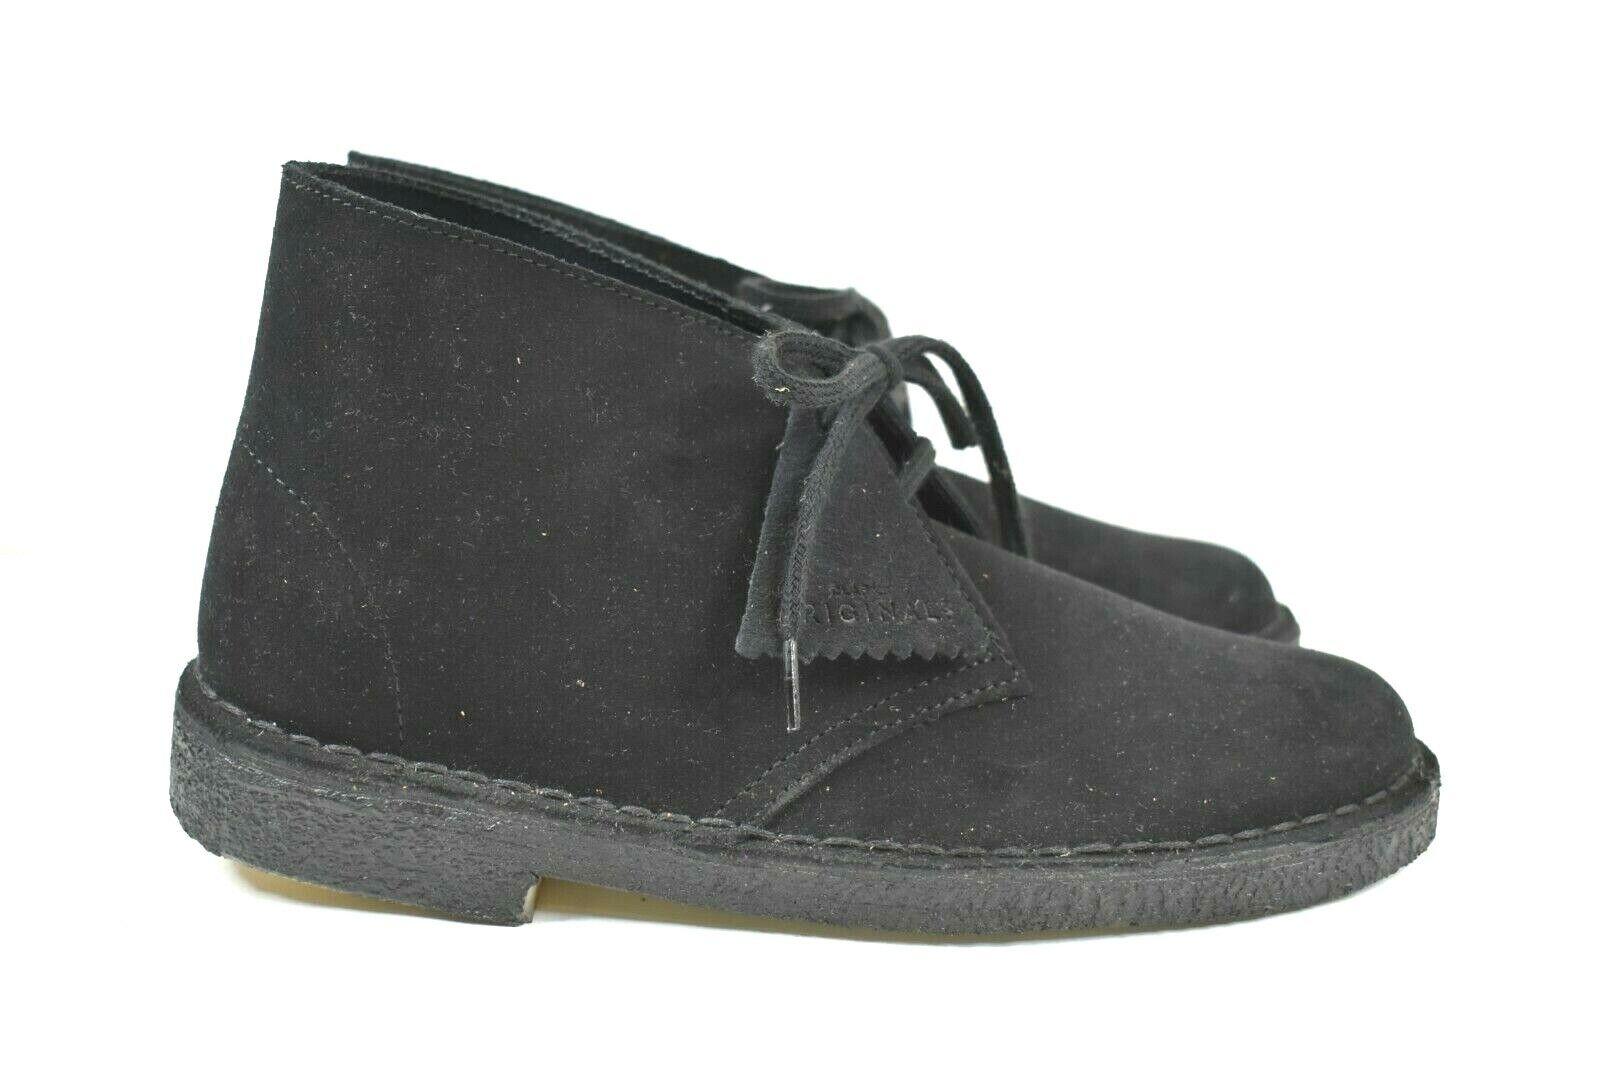 Clarks Women's Size 7.5 Lace Lace Lace Up Desert Boot Black Suede 26138214 b83126